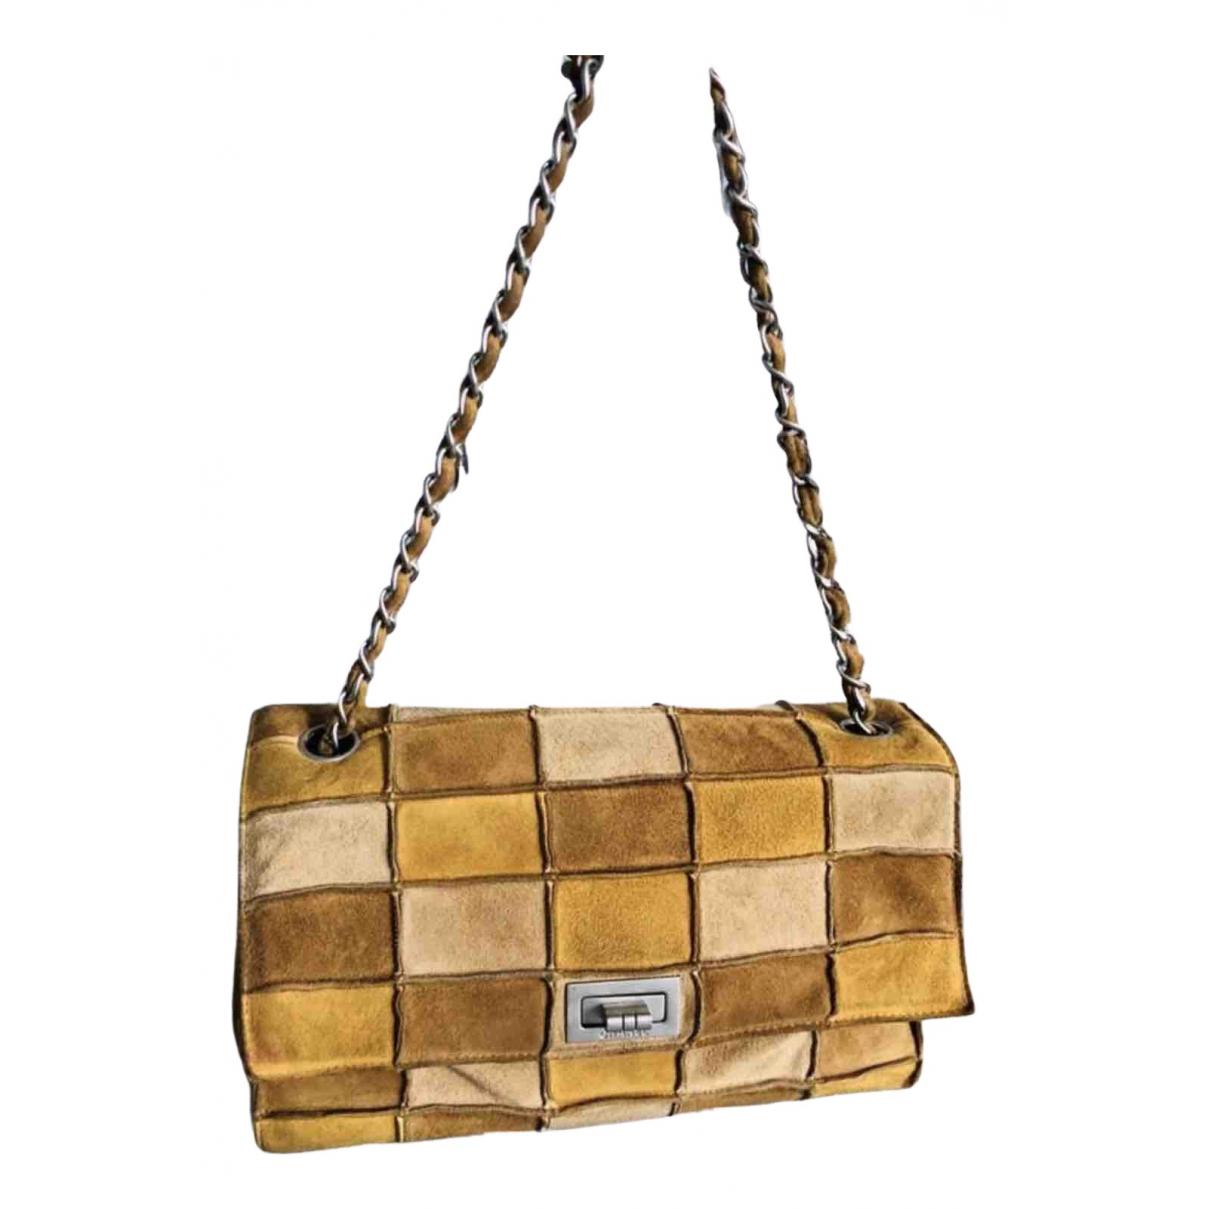 Chanel 2.55 Yellow Suede handbag for Women N